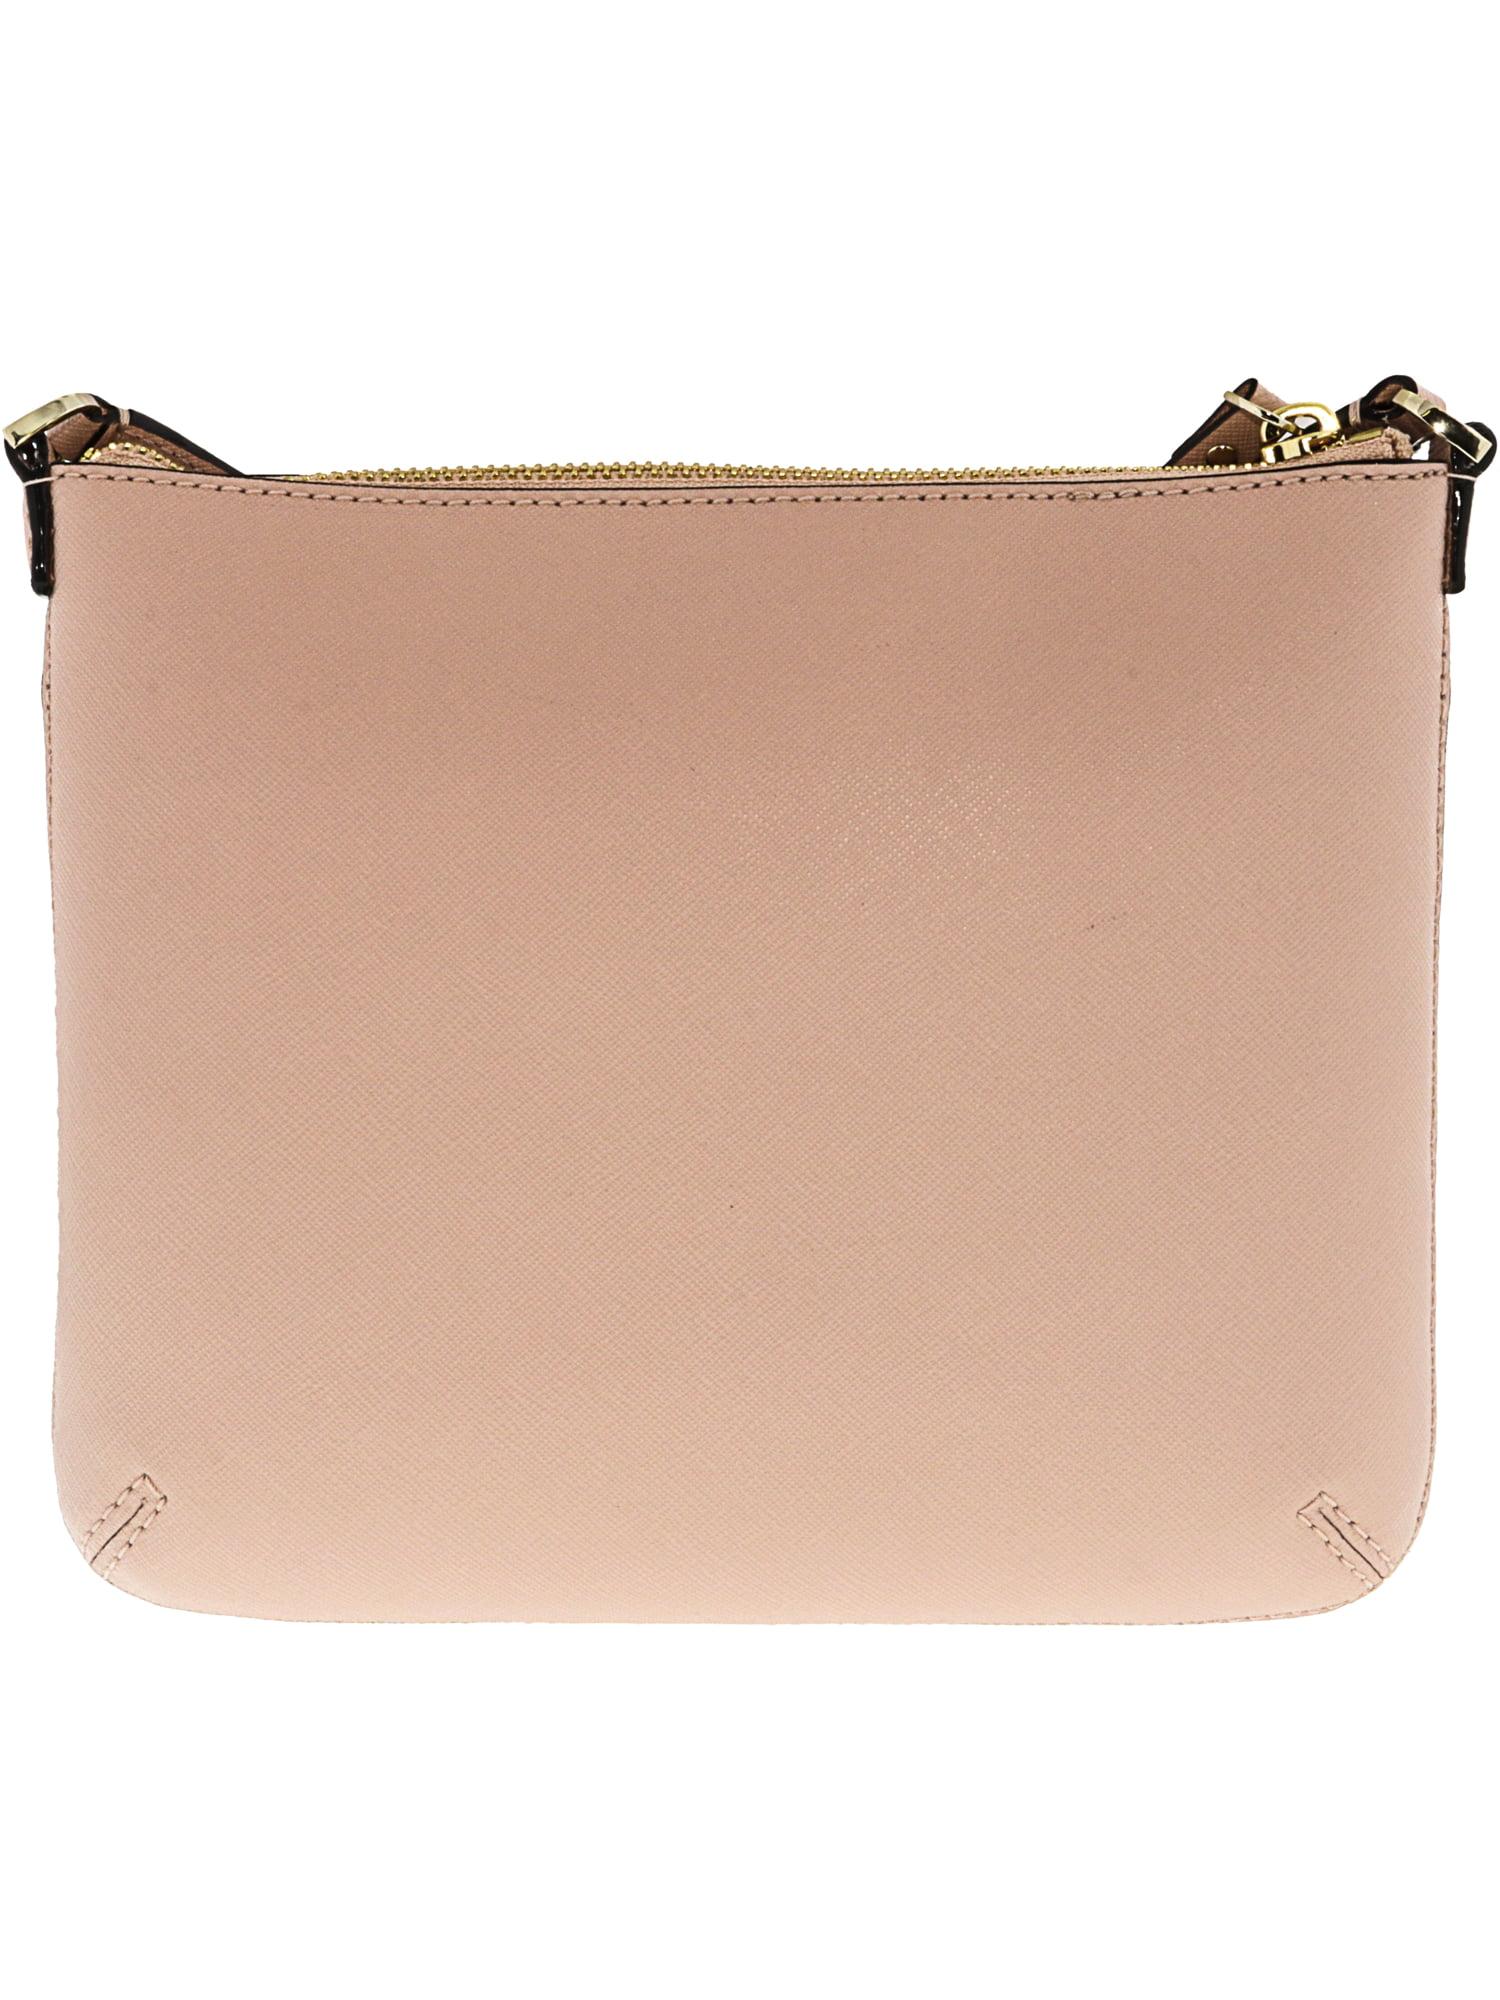 Women Silhouette Man Night Print Wallet Exquisite Clasp Coin Purse Girls Clutch Handbag